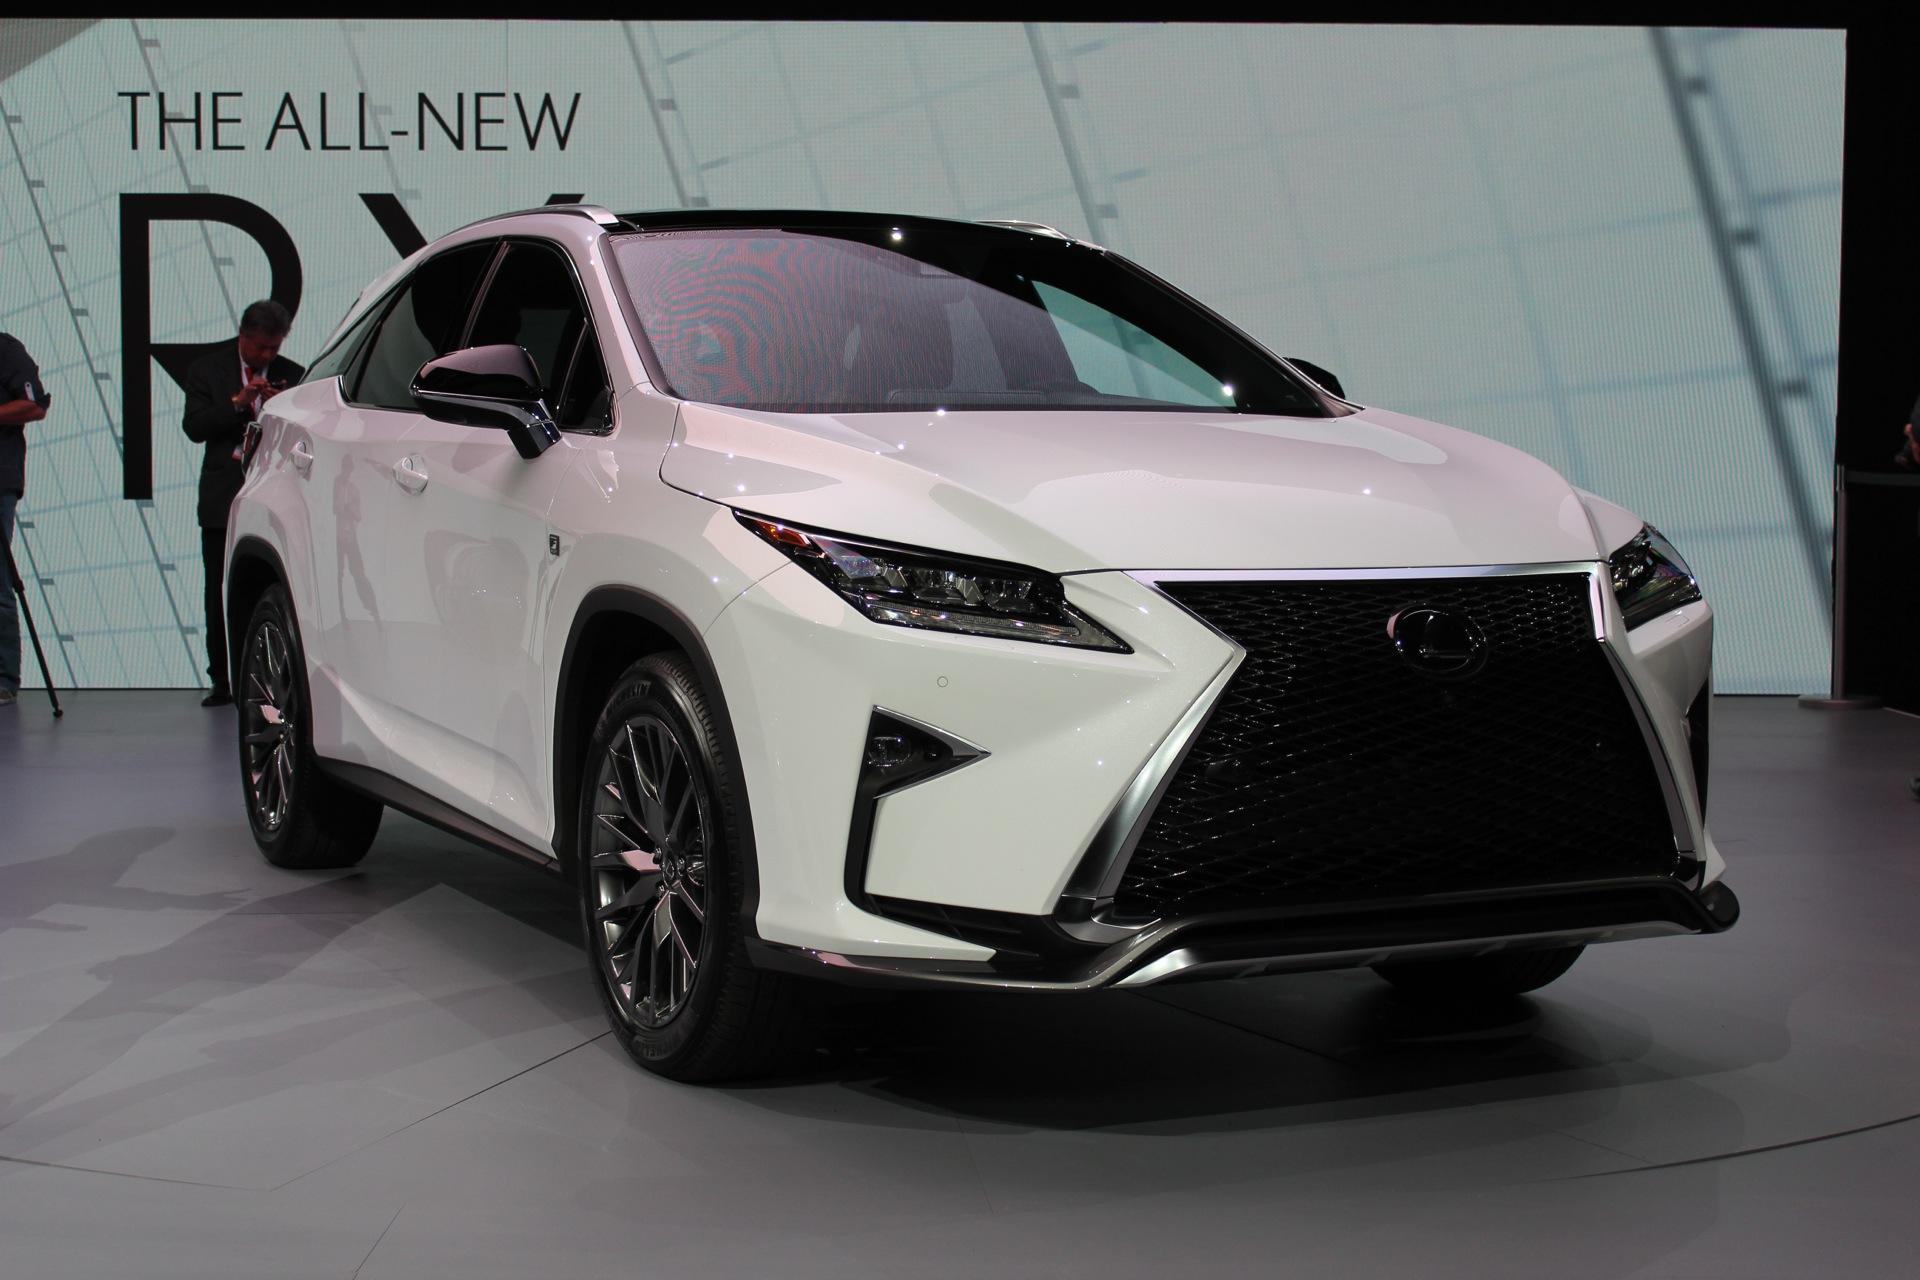 2016 Lexus Rx 2015 New York Auto Show Live Photos And Video